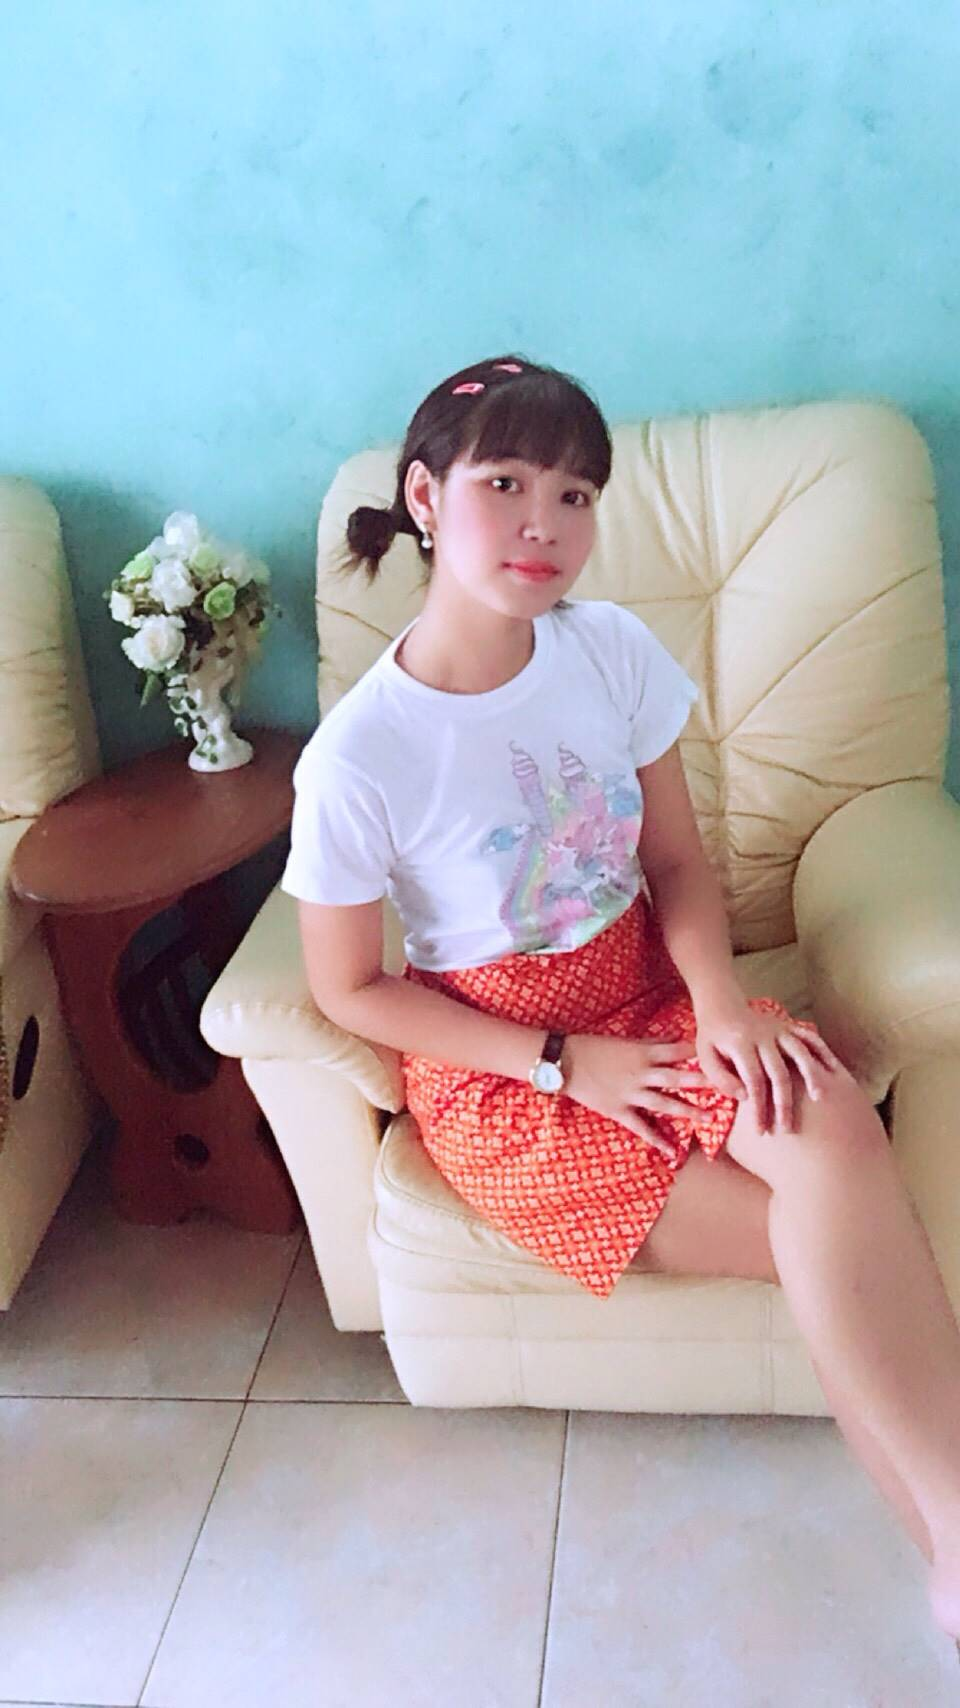 Daisuki by Lolita Chiang Mai